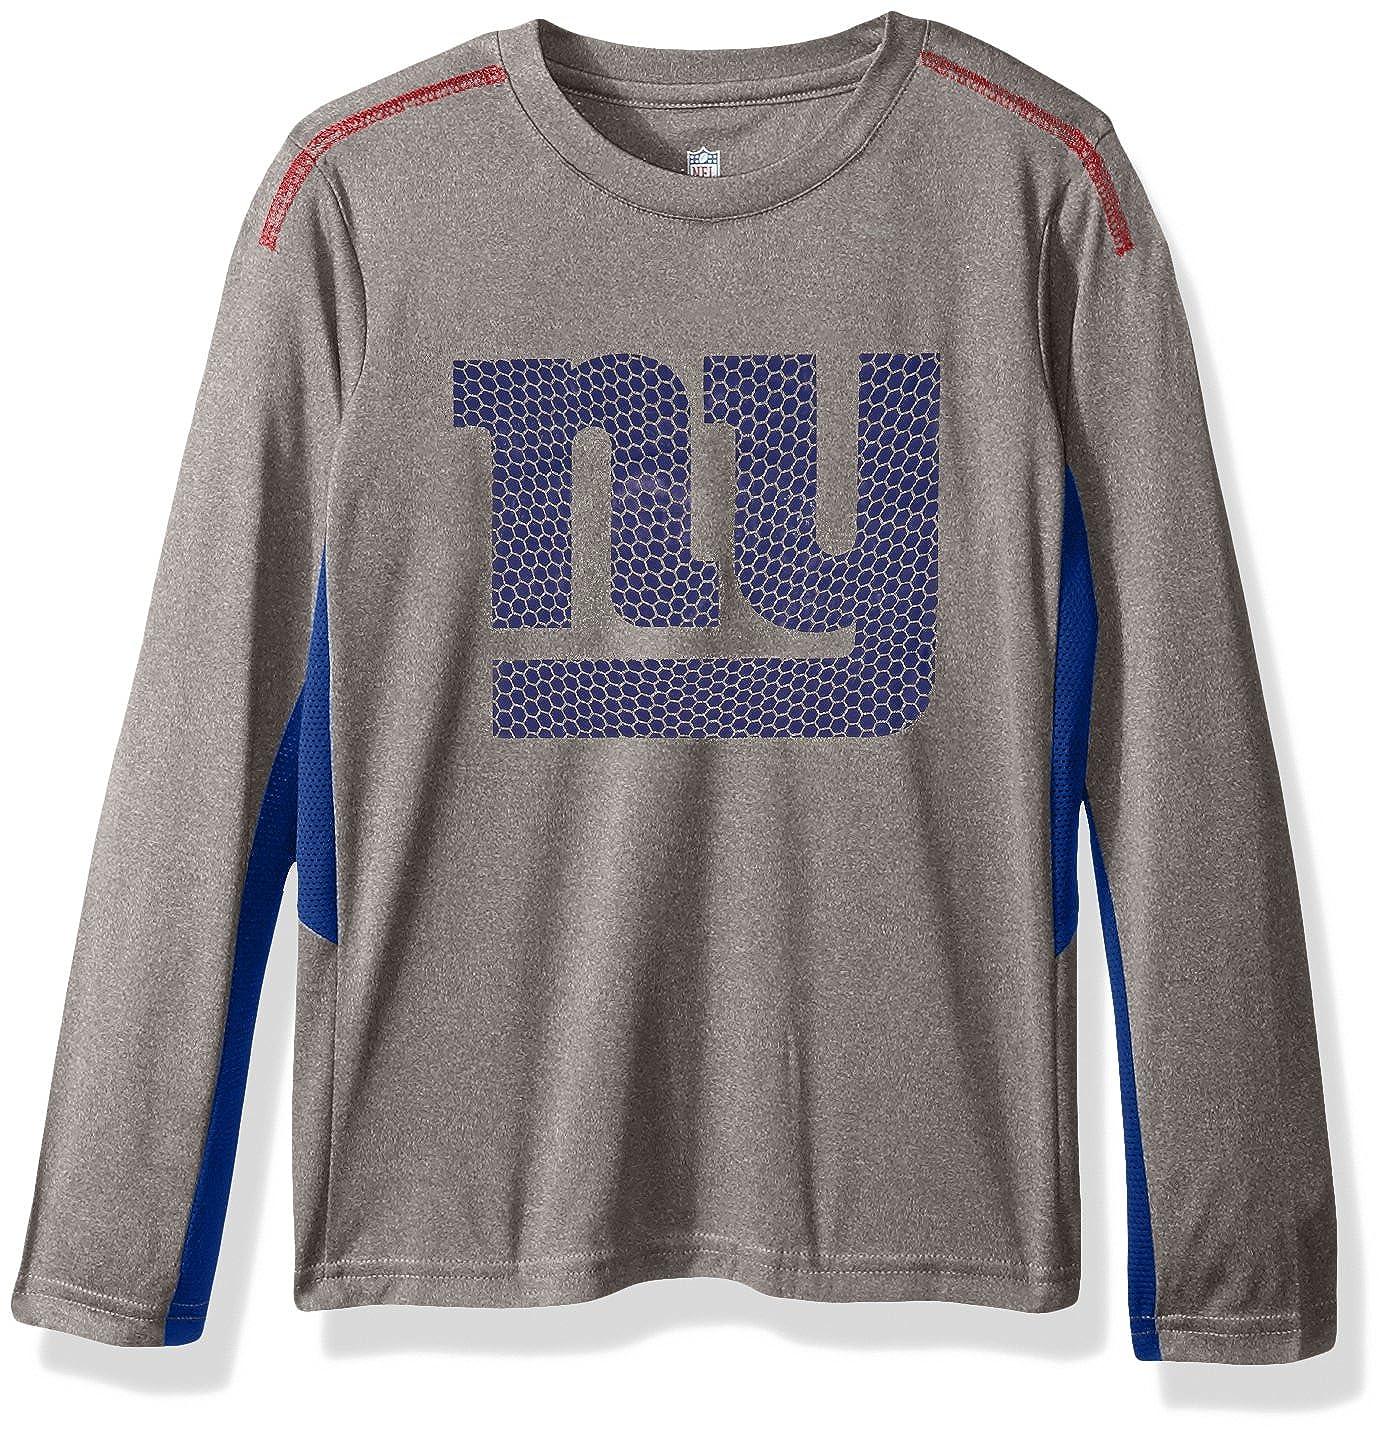 Kids Small 4 Outerstuff NFL New York Giants Kids Classic Gridiron Long Sleeve Raglan Tee Dark Grey Heather